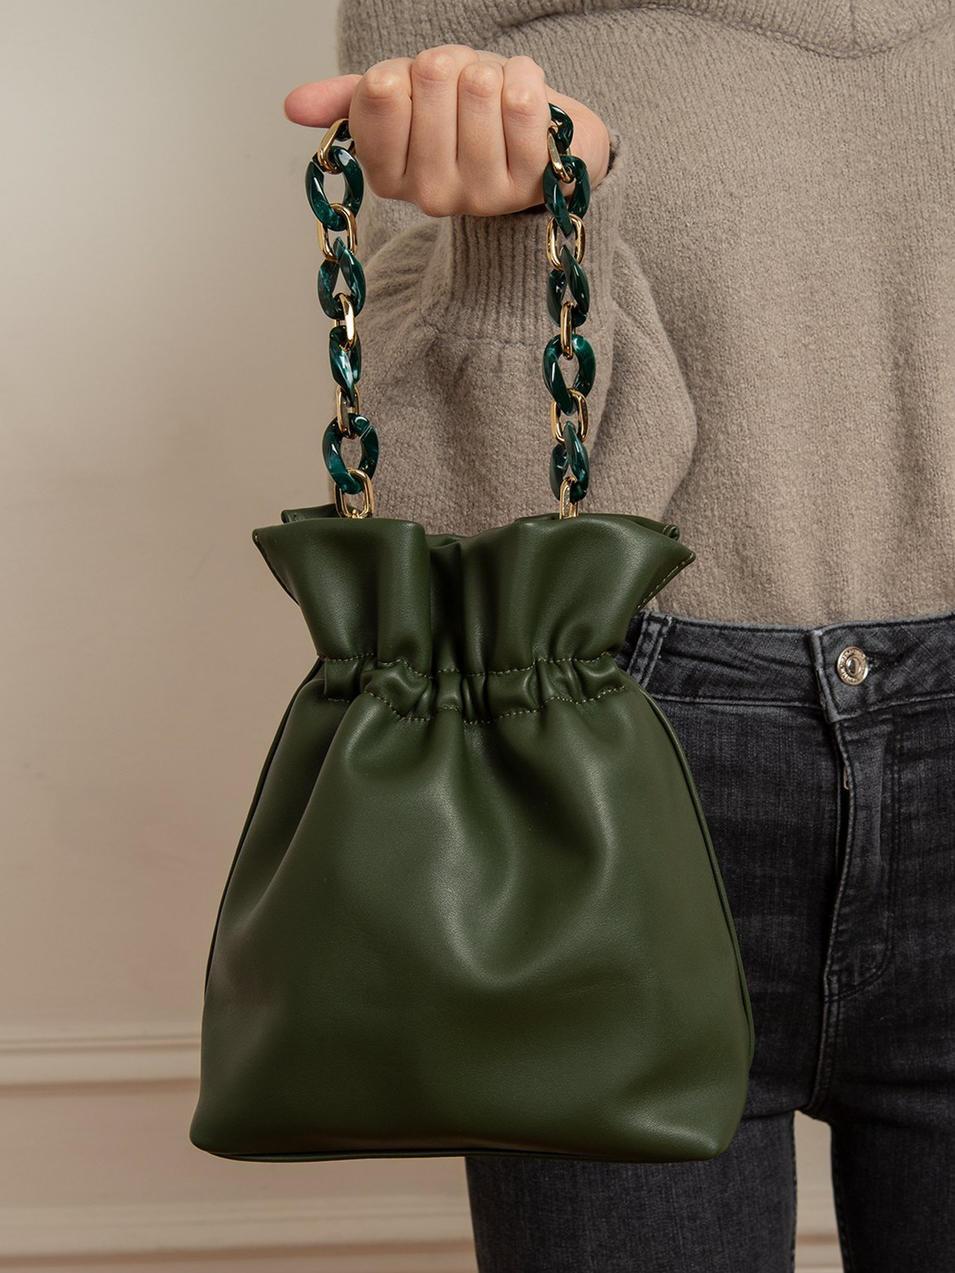 RKY0147 Customized logo summer design crossbody bag women vintage leather bucket handbags with acrylic olive chain